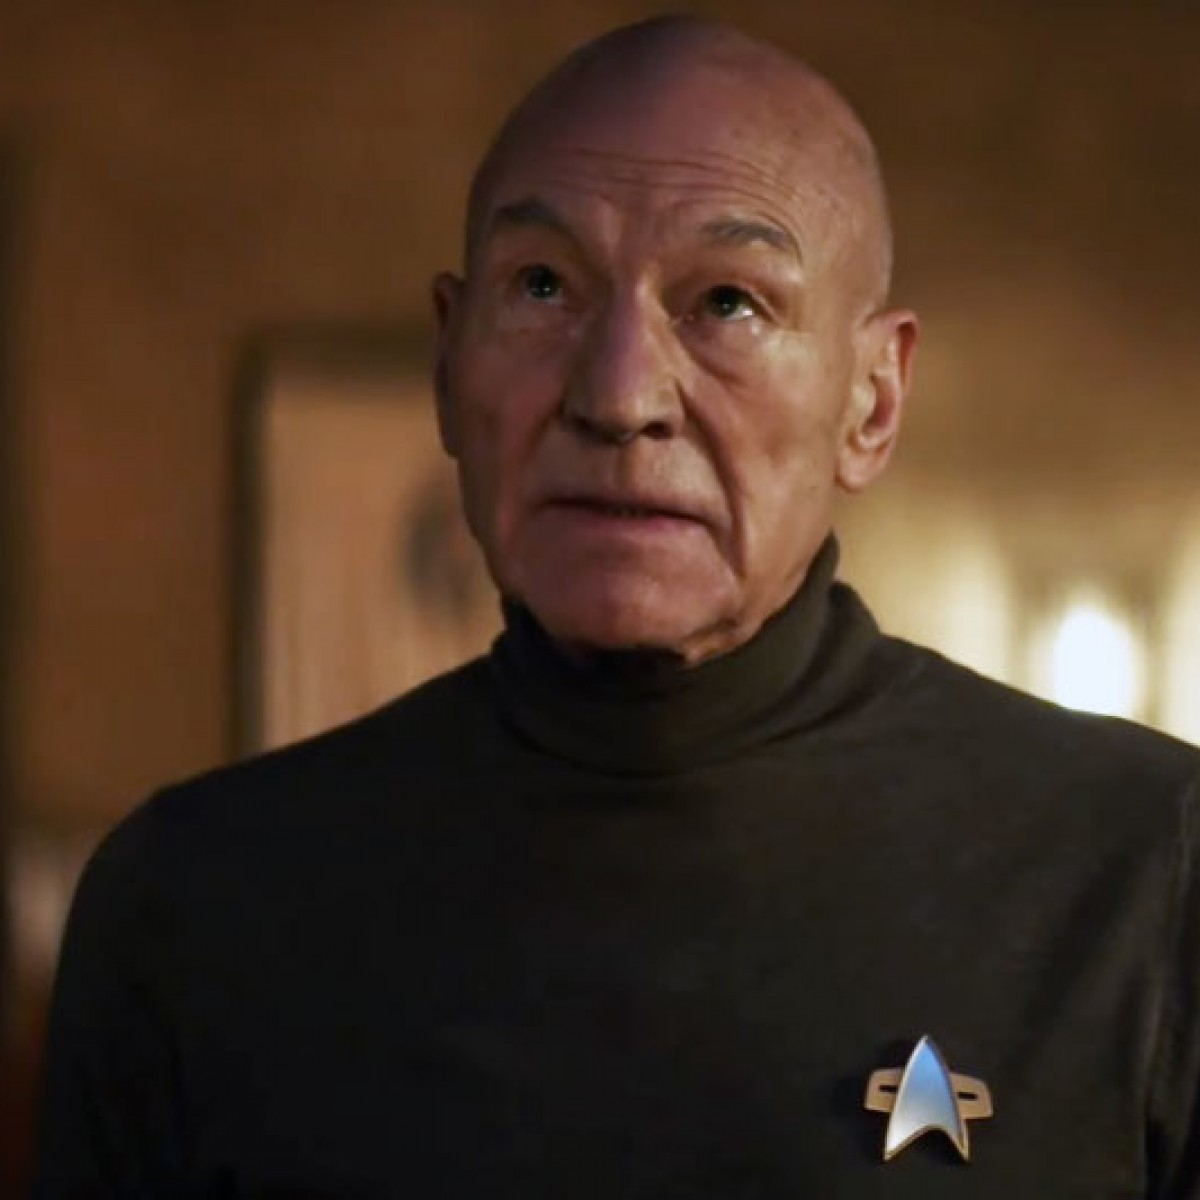 Picard Darsteller